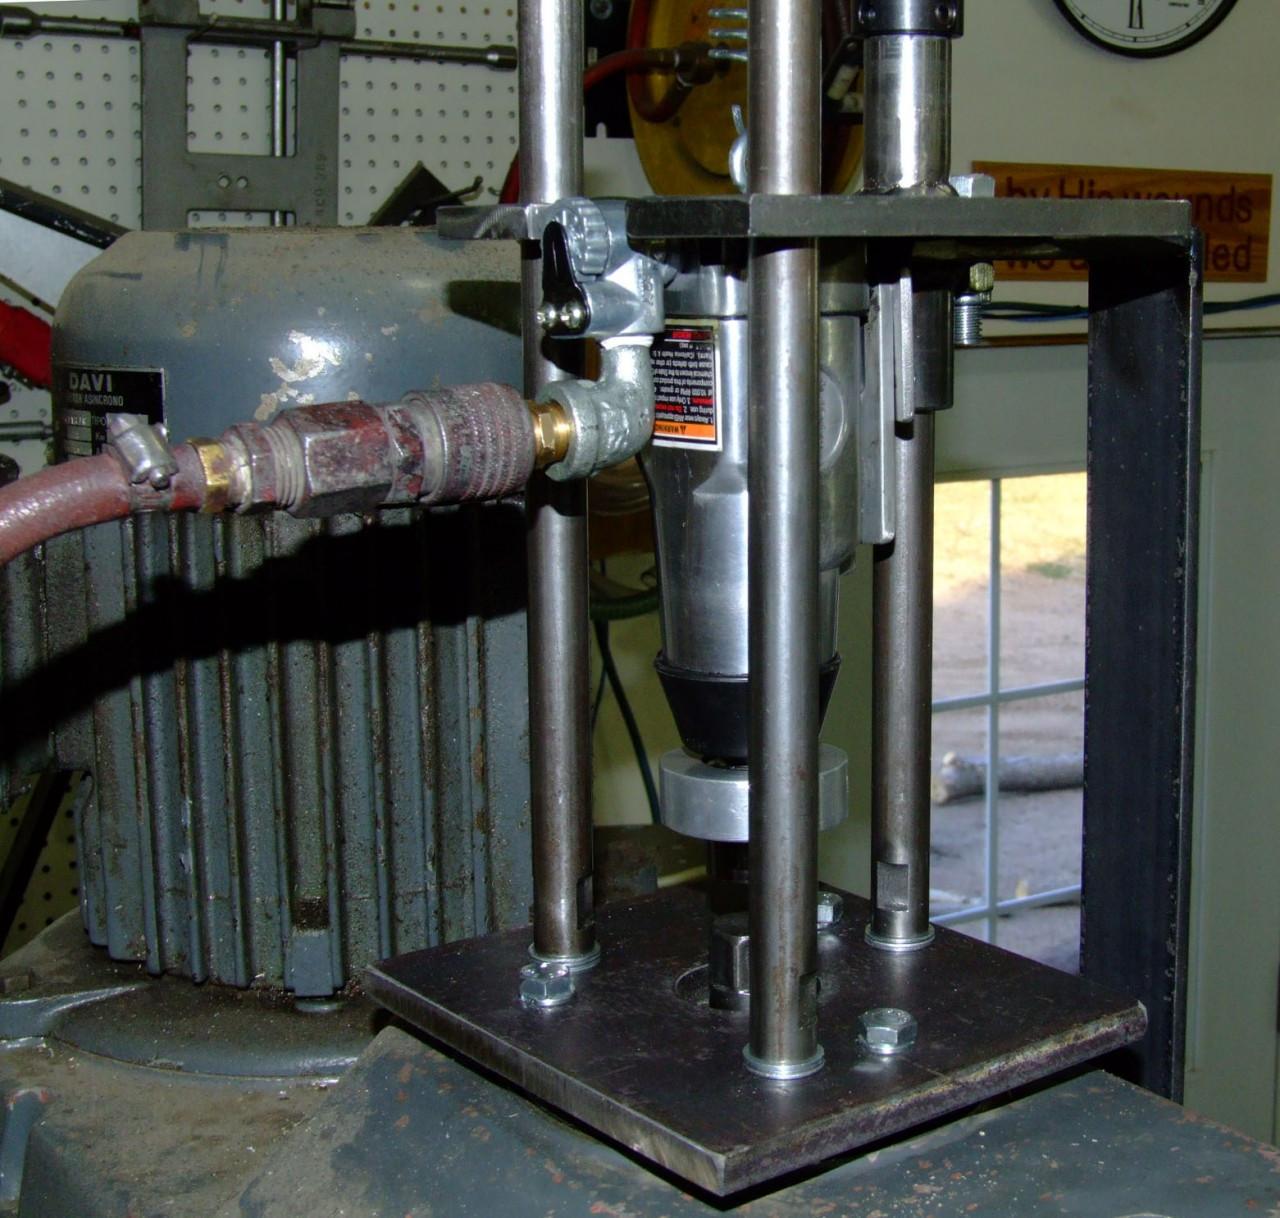 Power Drawbar Plans for Vertical Mill